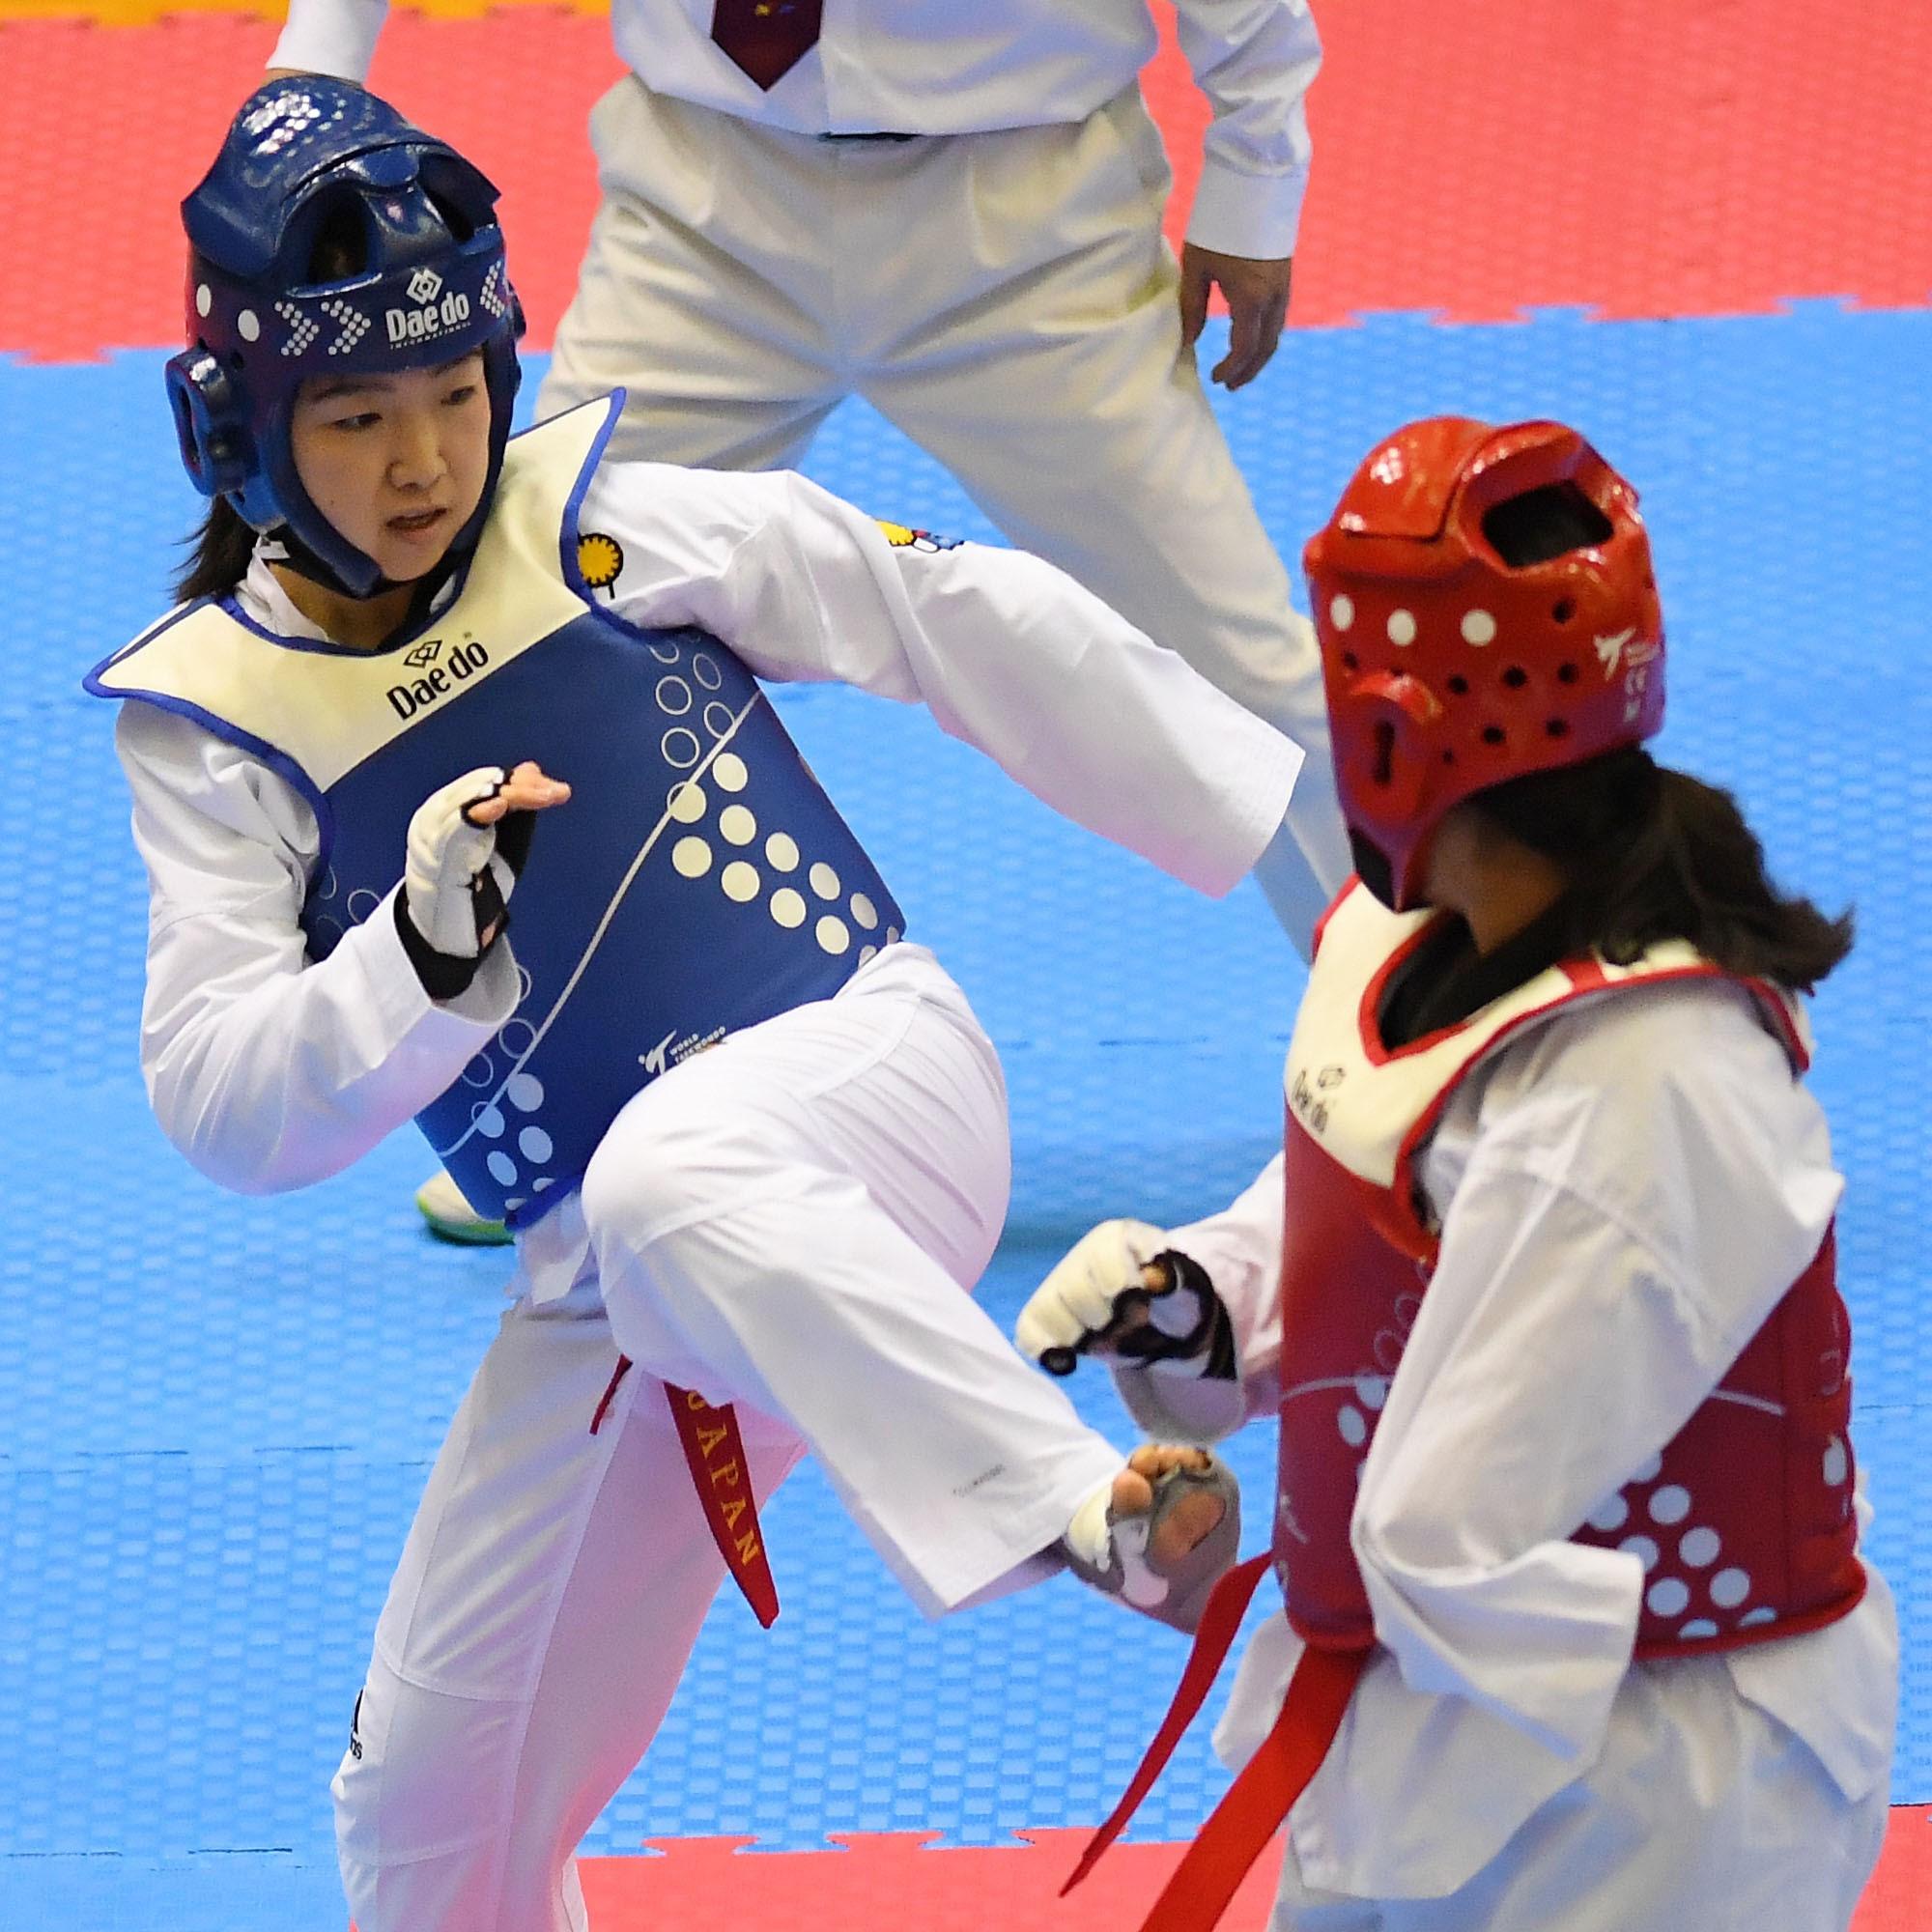 Shoko Ota: The Paralympic medallist who swapped skis for taekwondo